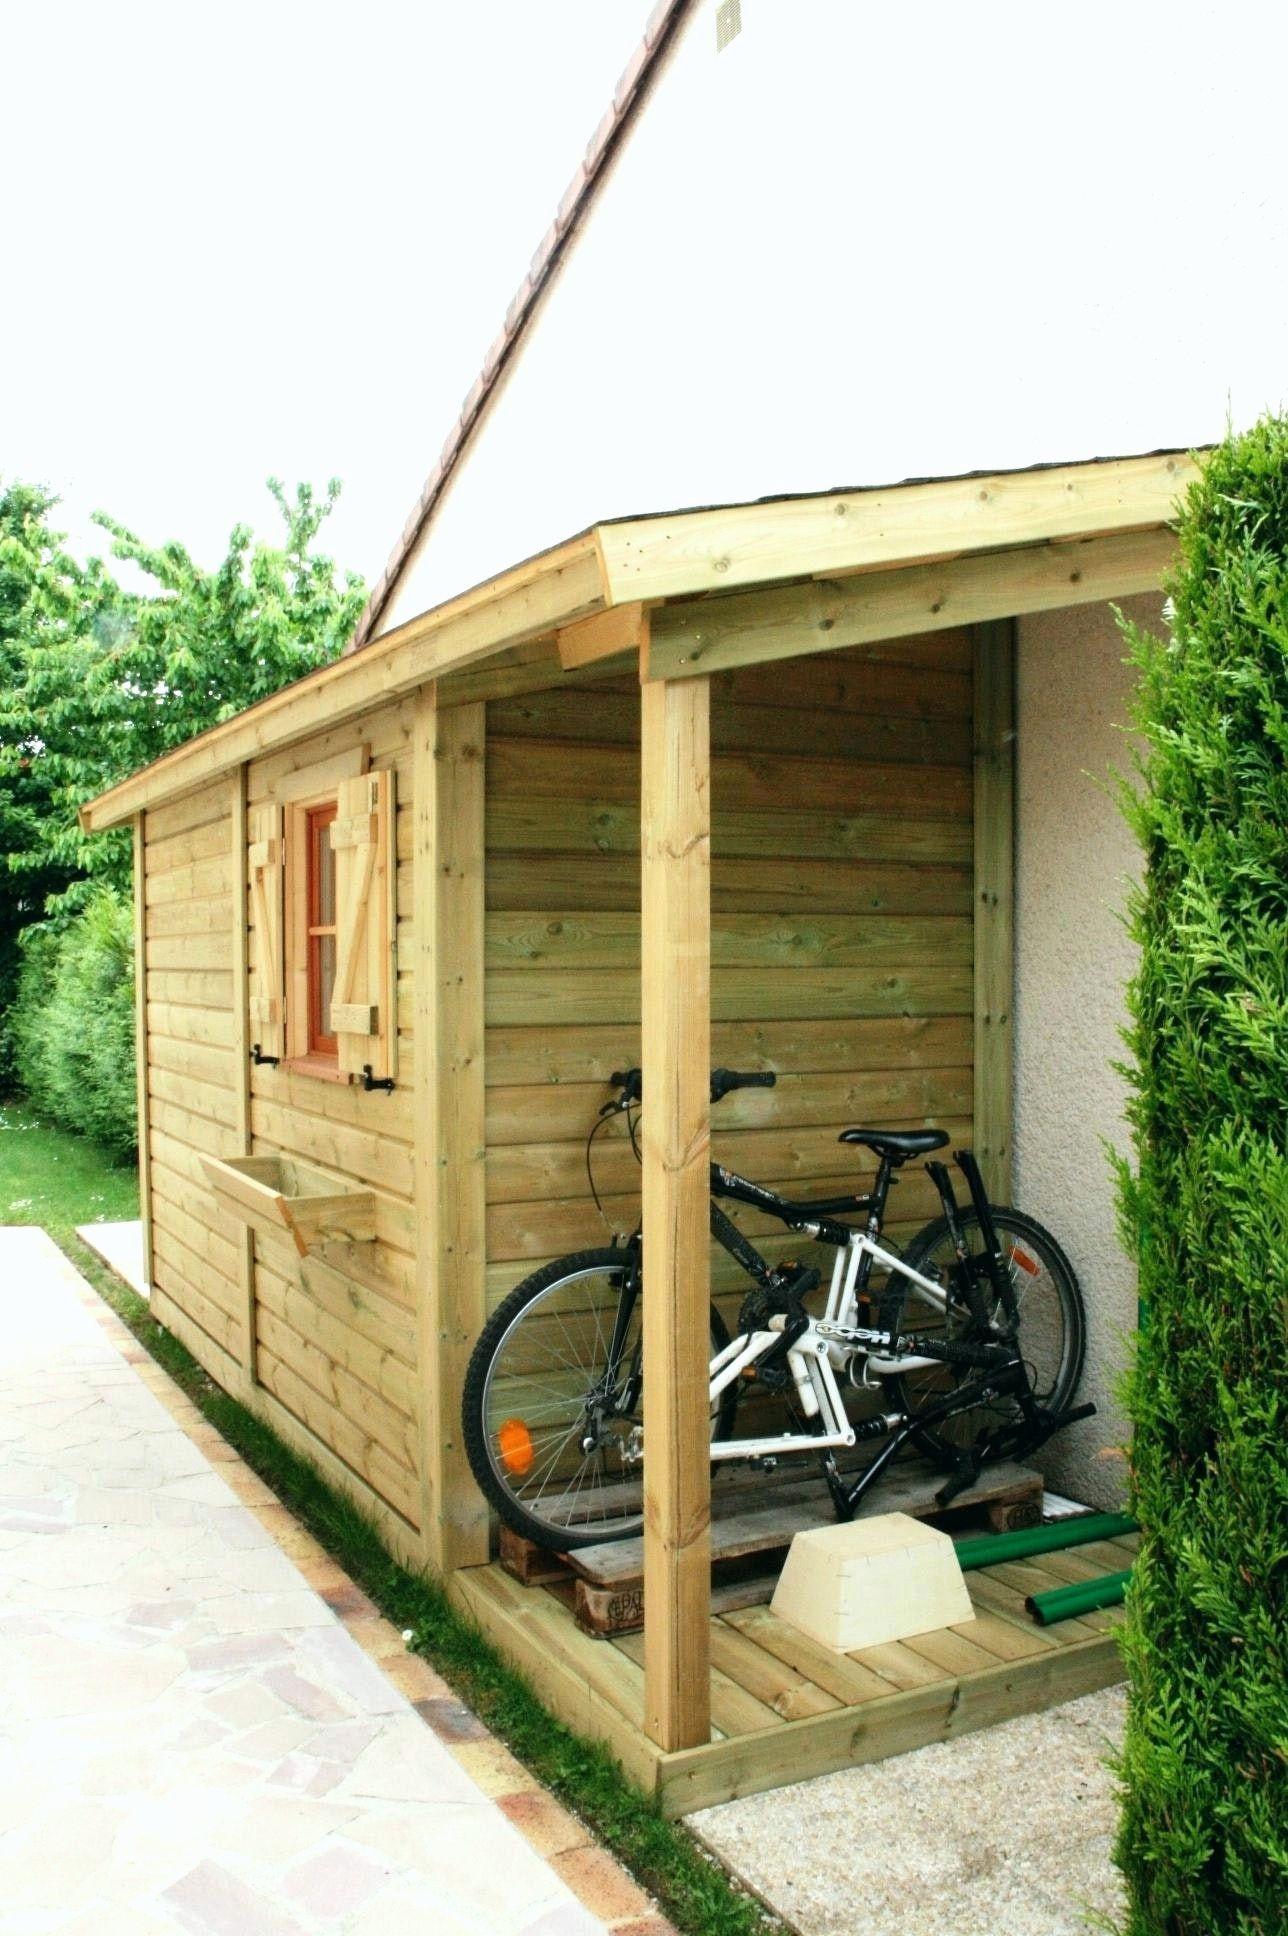 Meuble Abri De Jardin In 2020 | Outdoor Sheds, Outdoor ... encequiconcerne Abri De Jardin Brico Depot